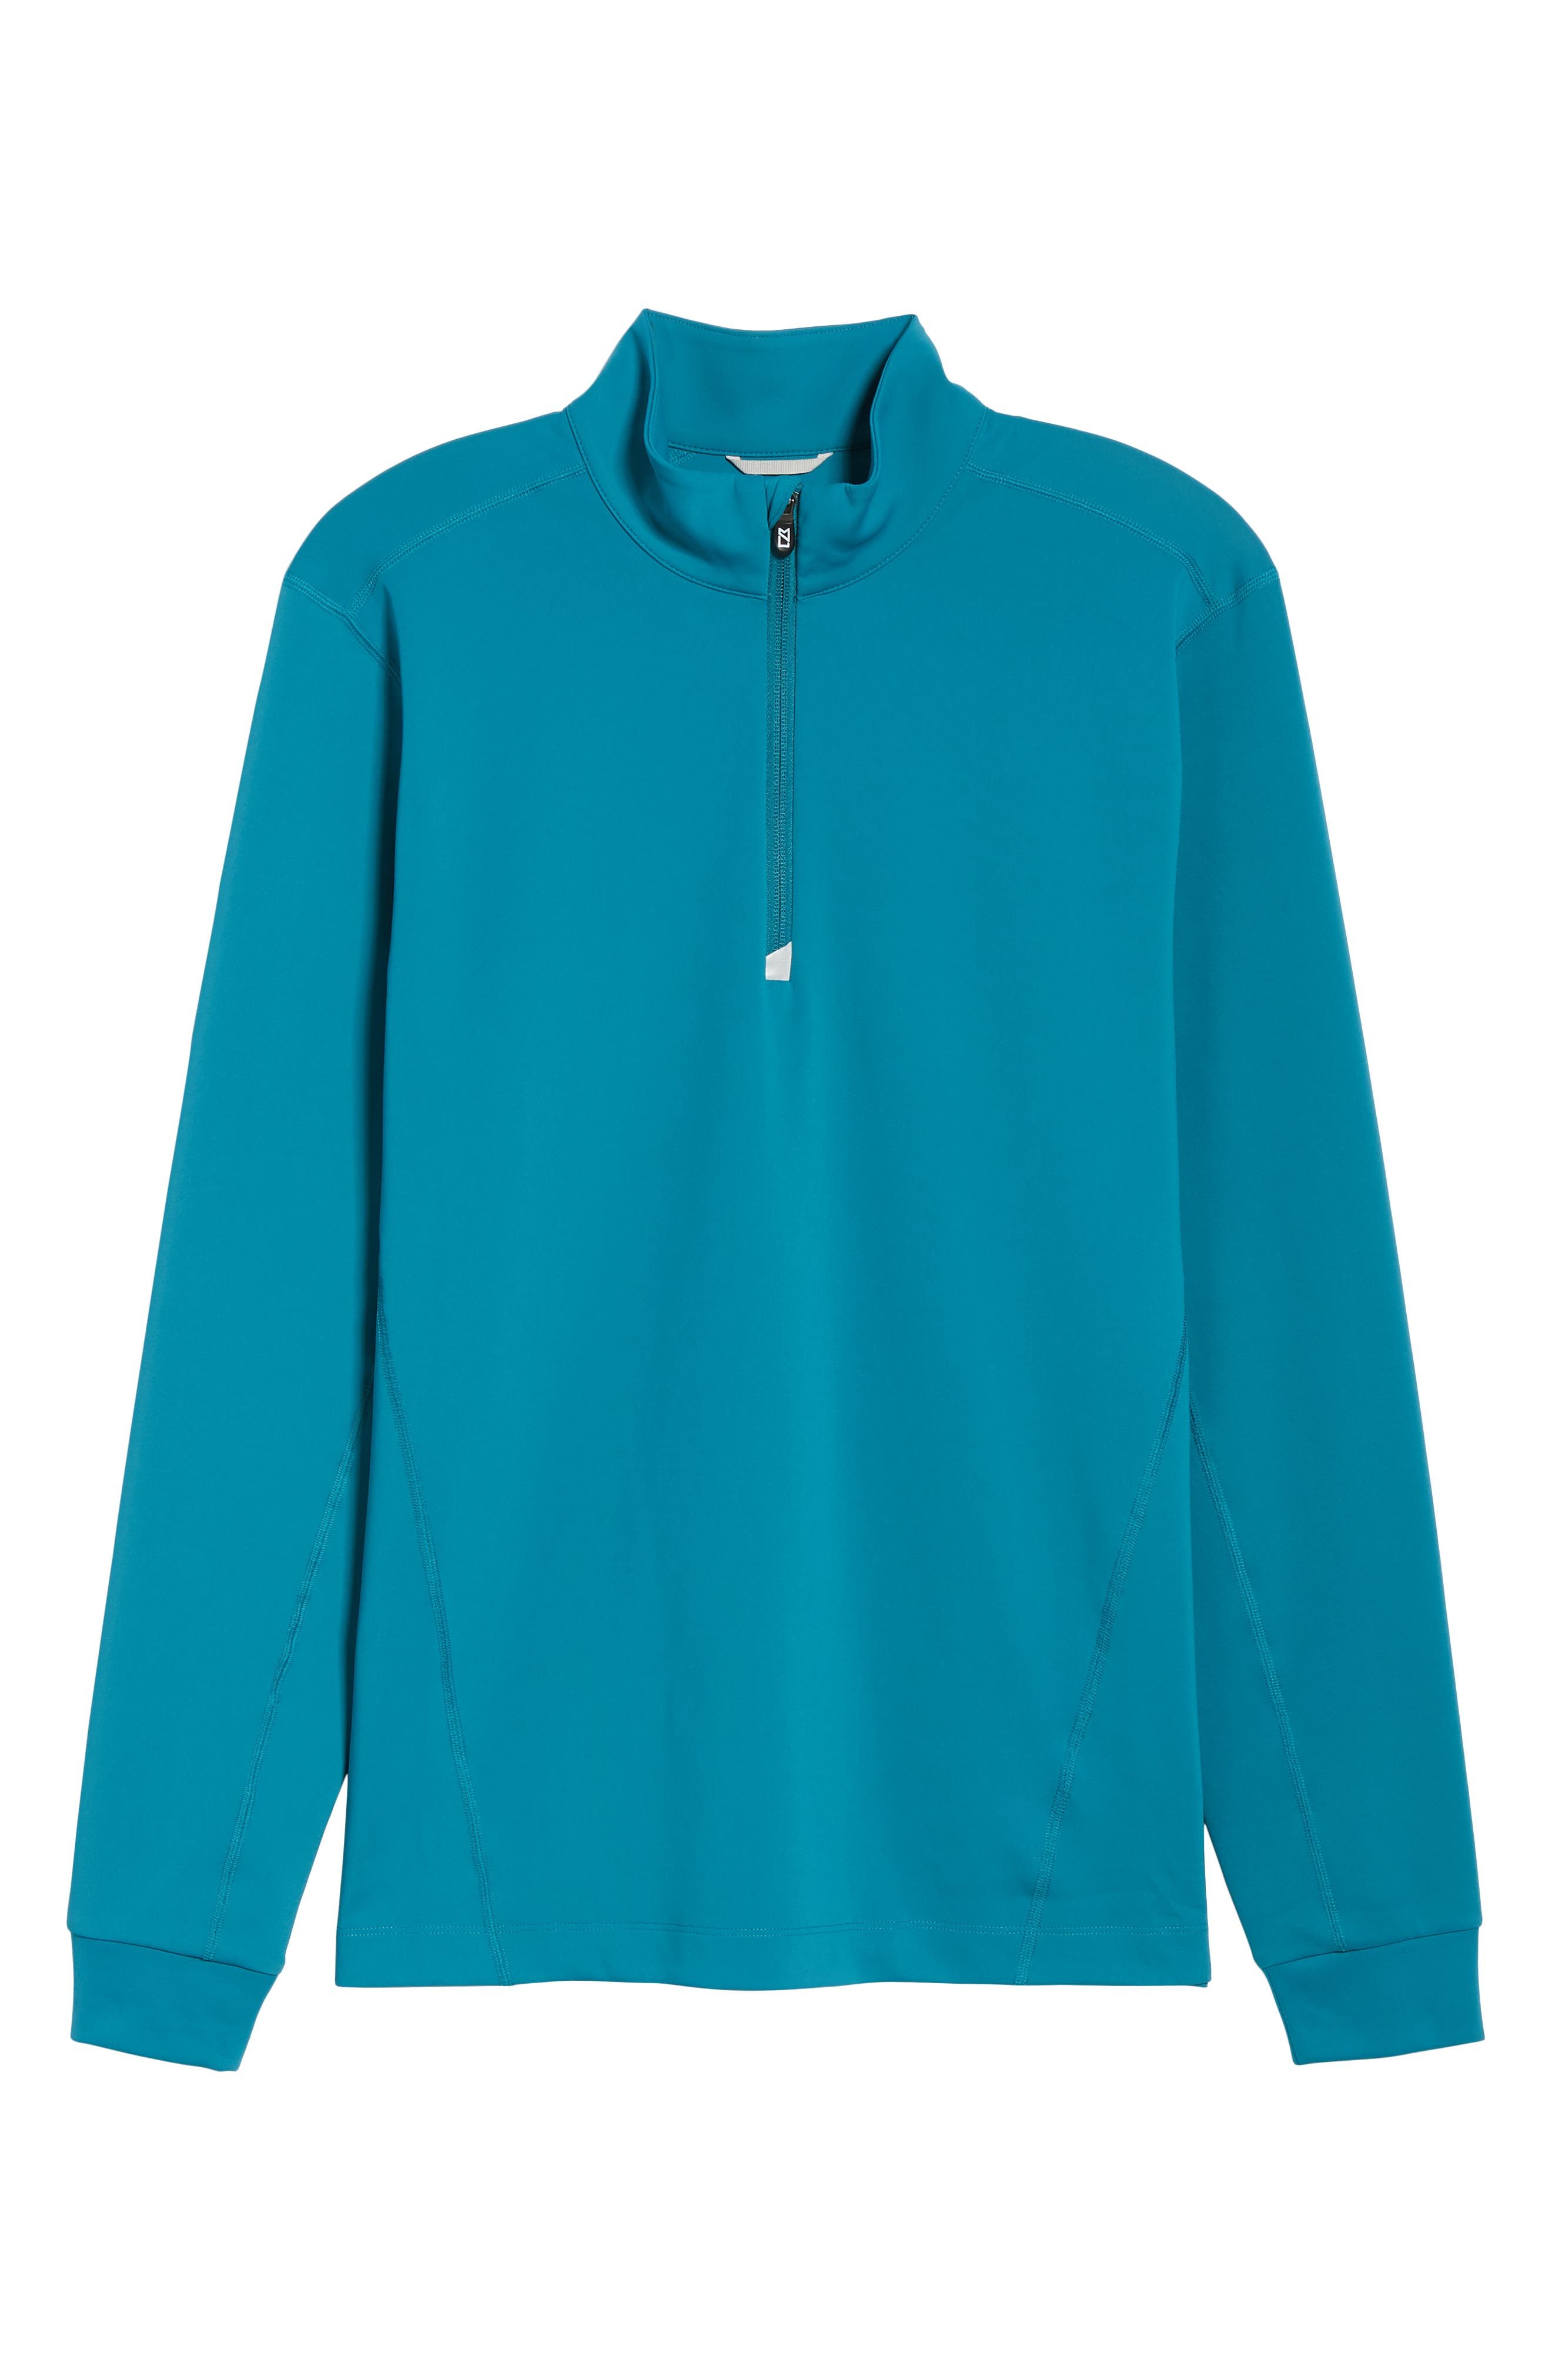 Traverse Regular Fit Quarter Zip Pullover,                             Alternate thumbnail 6, color,                             TEAL BLUE